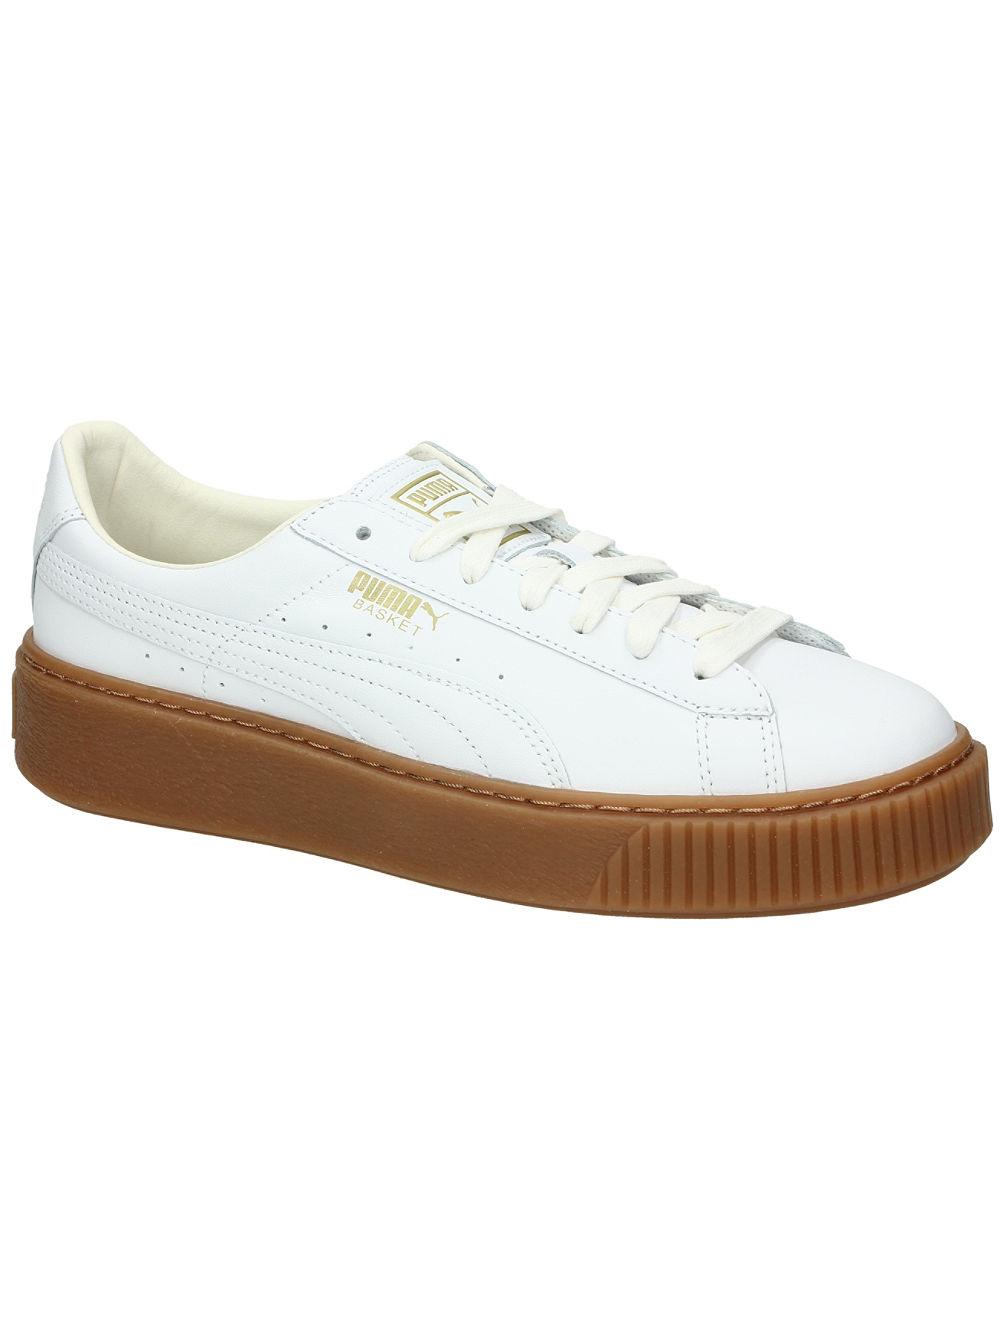 Buy Puma Basket Platform Core Sneakers Women Online At